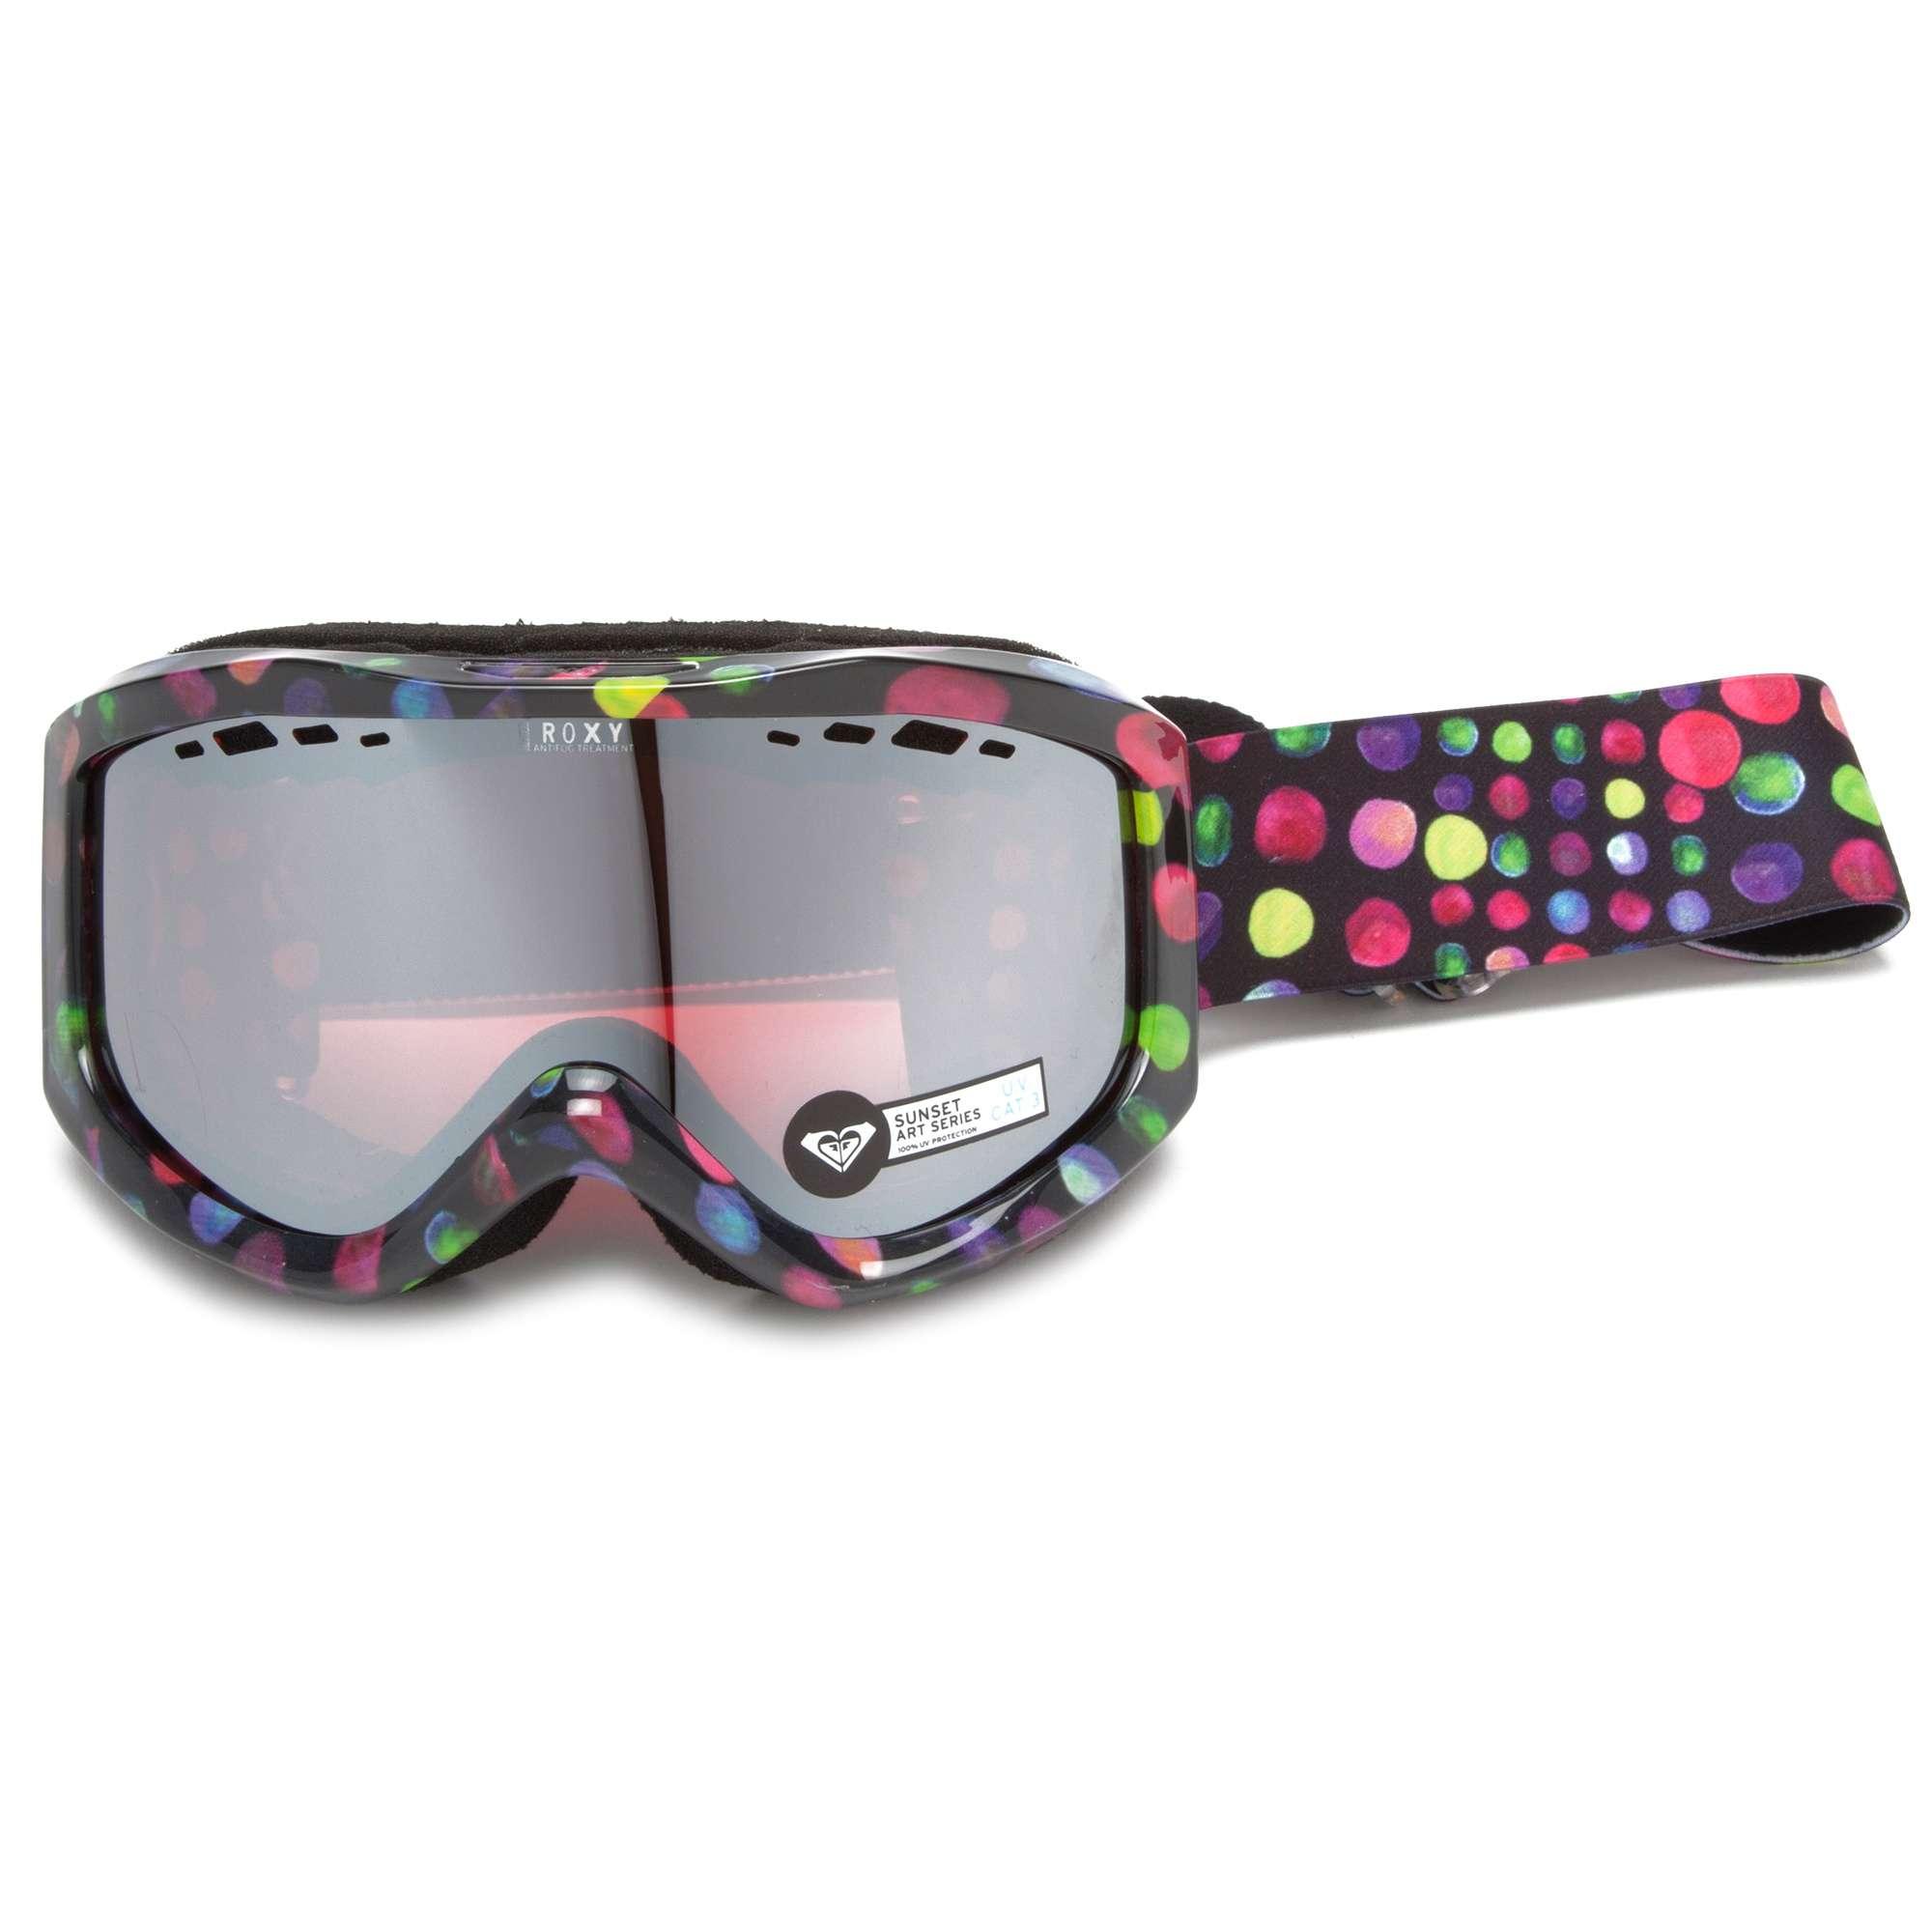 ROXY Women's Sunset Art Ski Goggles